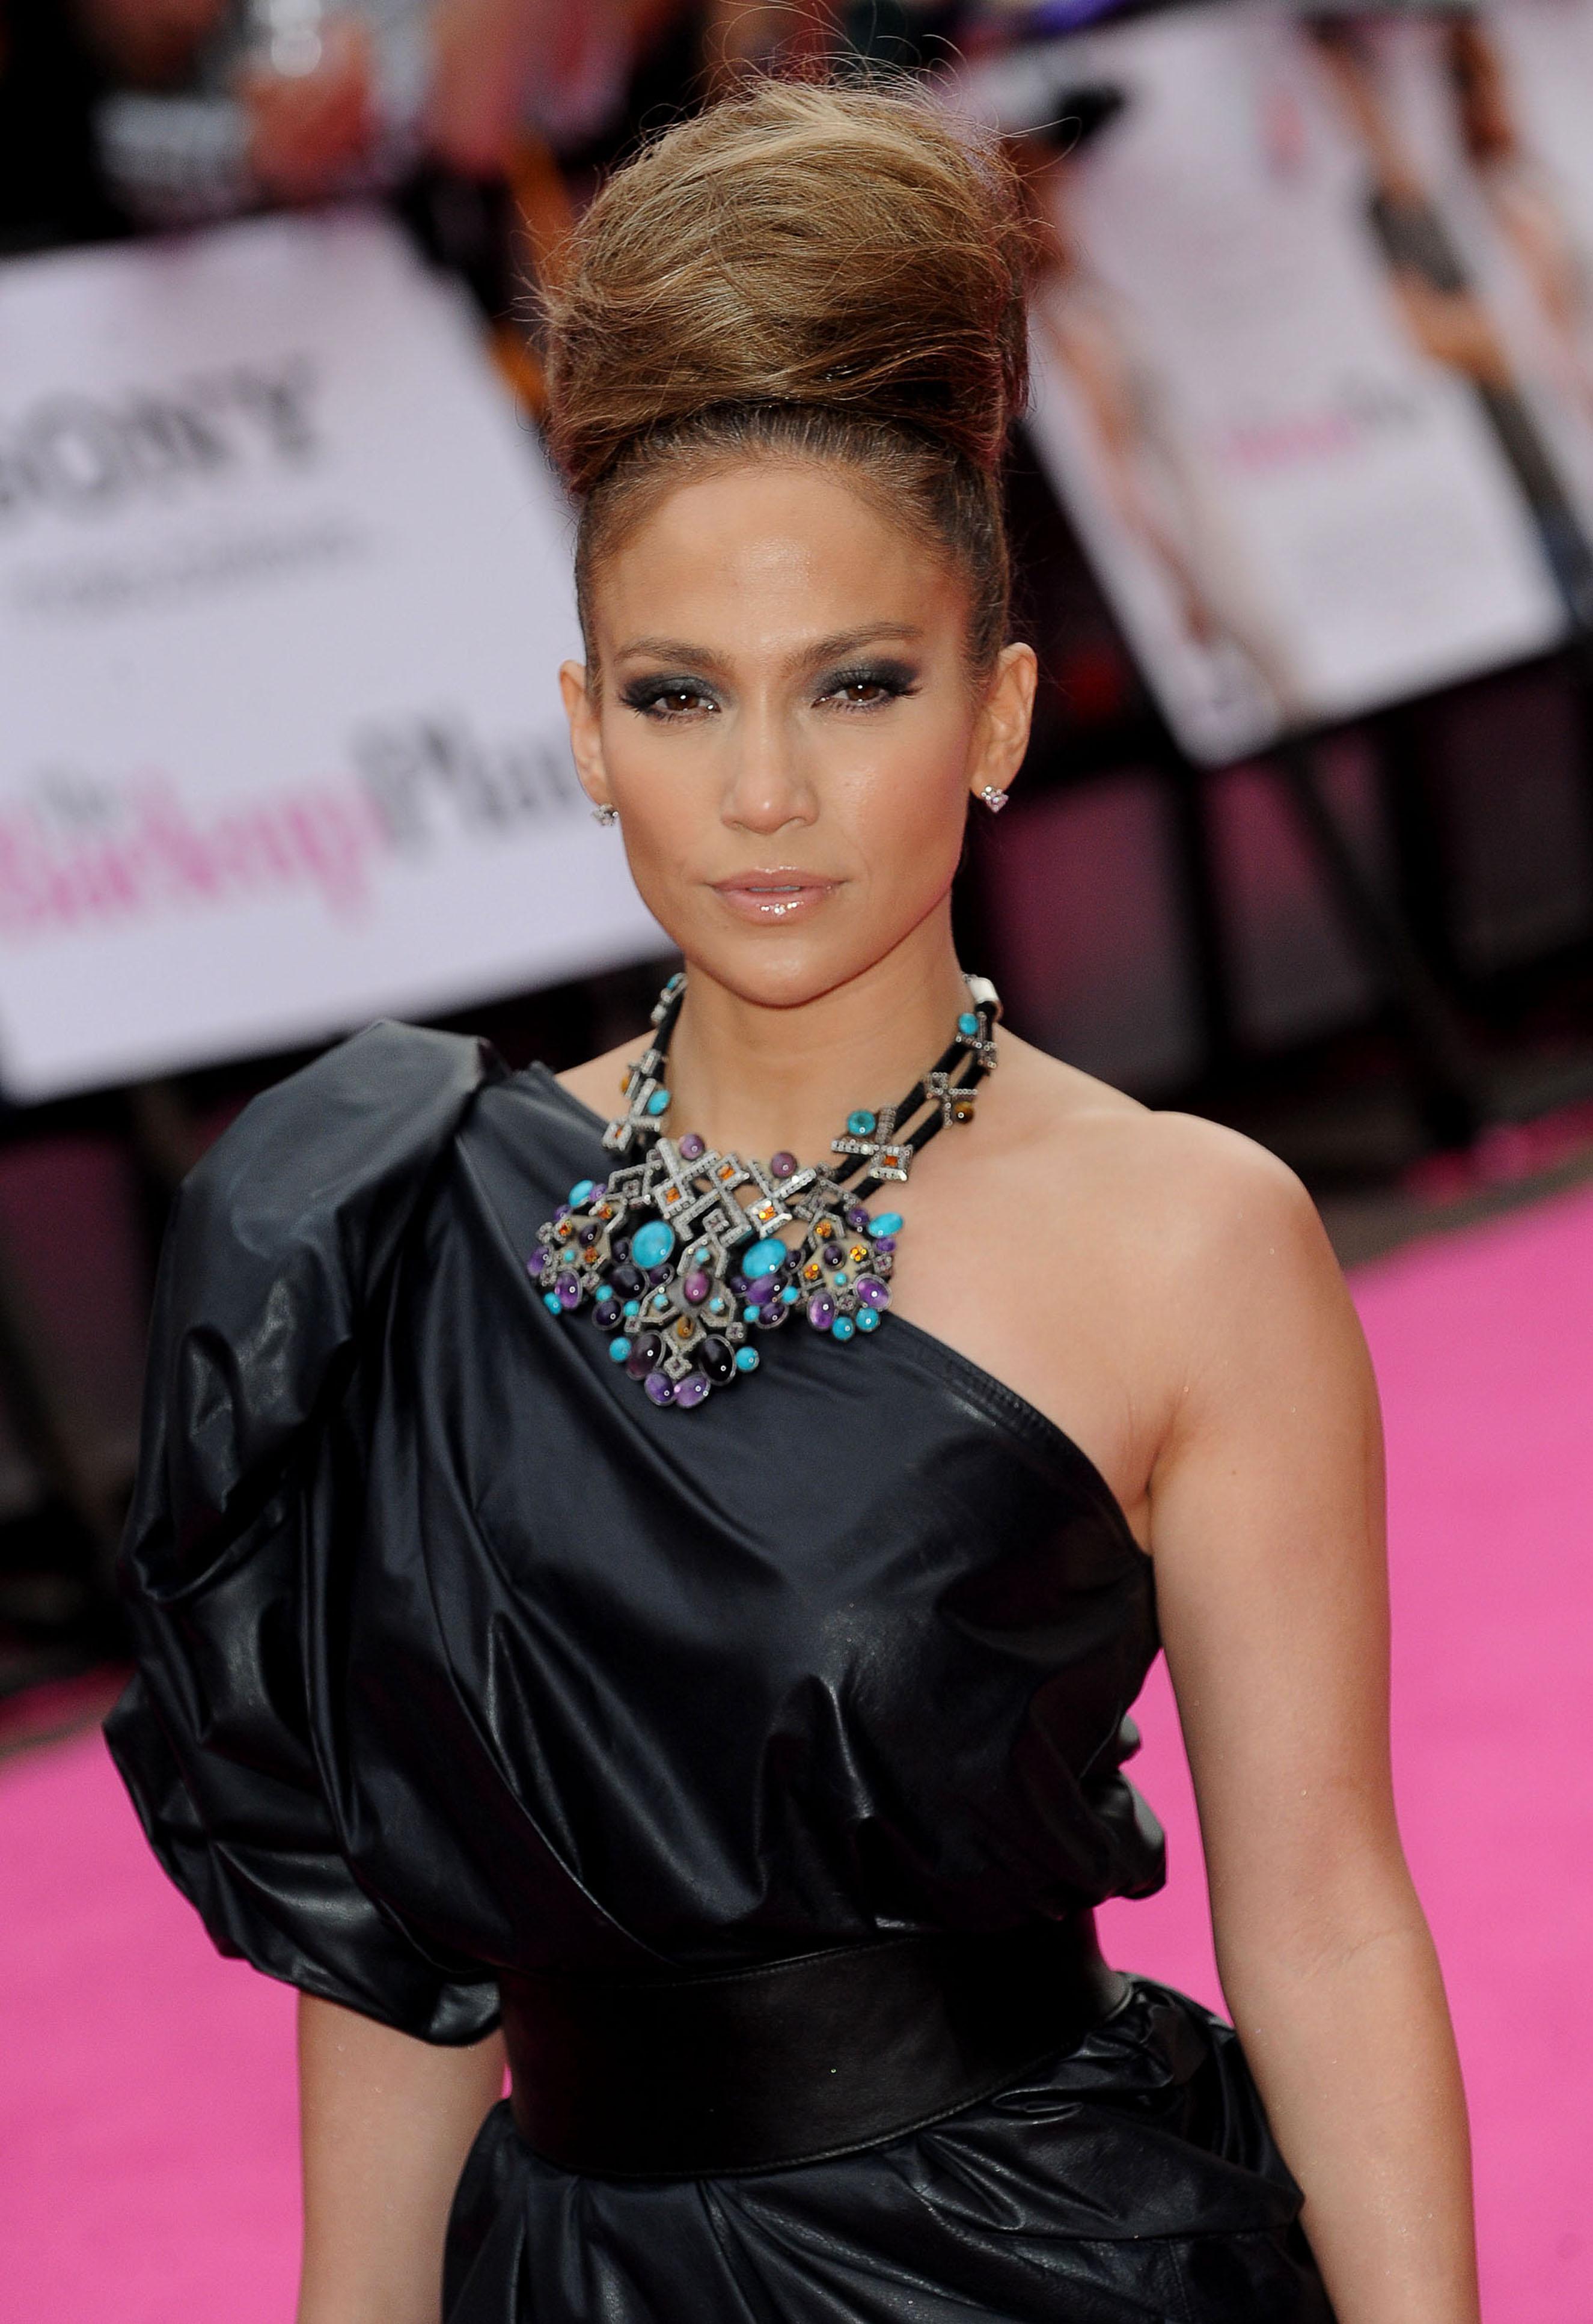 50733_celebrity_paradise.com_TheElder_JenniferLopez2010_04_28_TheBack_UpPlanUKPremiere53_122_259lo.jpg